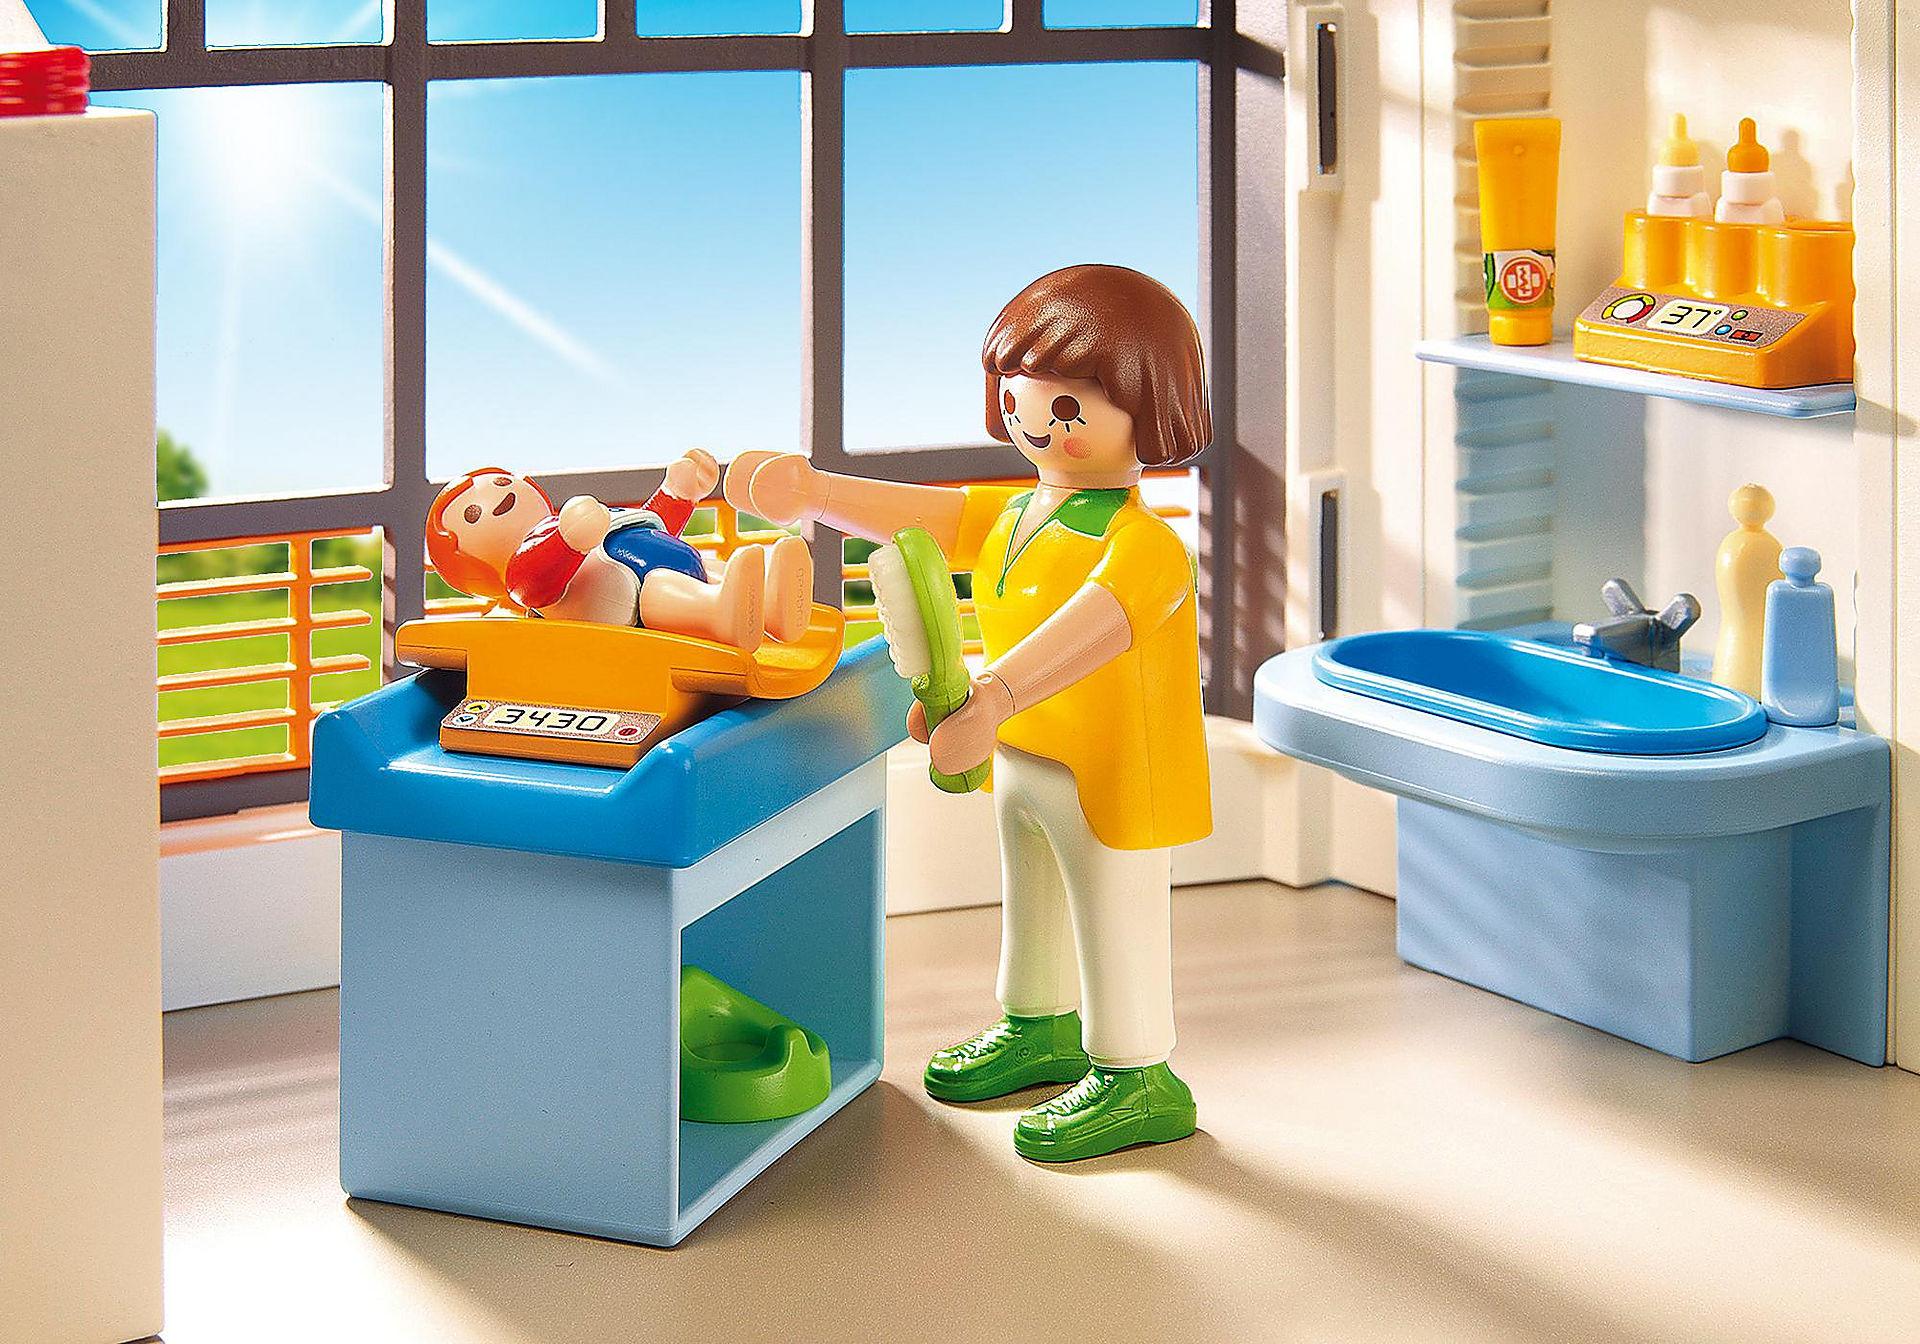 http://media.playmobil.com/i/playmobil/6657_product_extra3/Compleet ingericht kinderziekenhuis